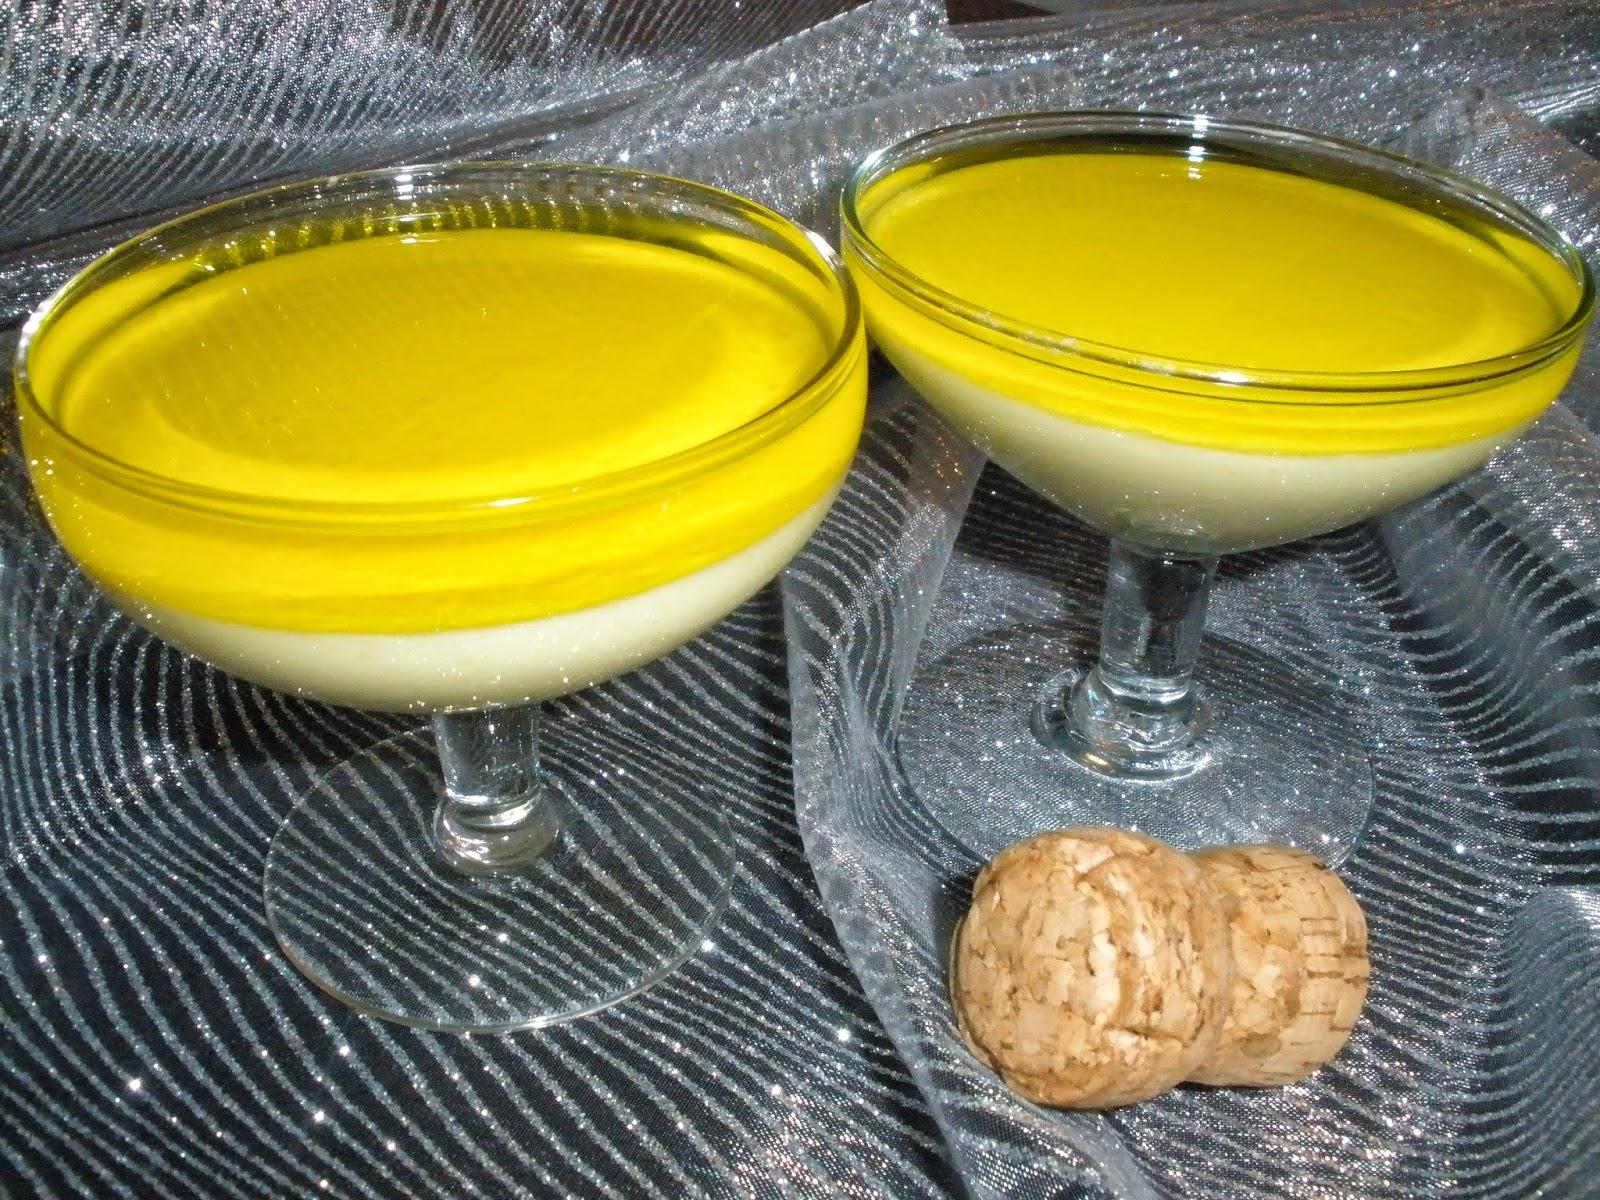 http://acocinate.blogspot.com.es/2015/02/san-valentin-postre-de-sorbete-de-limon.html